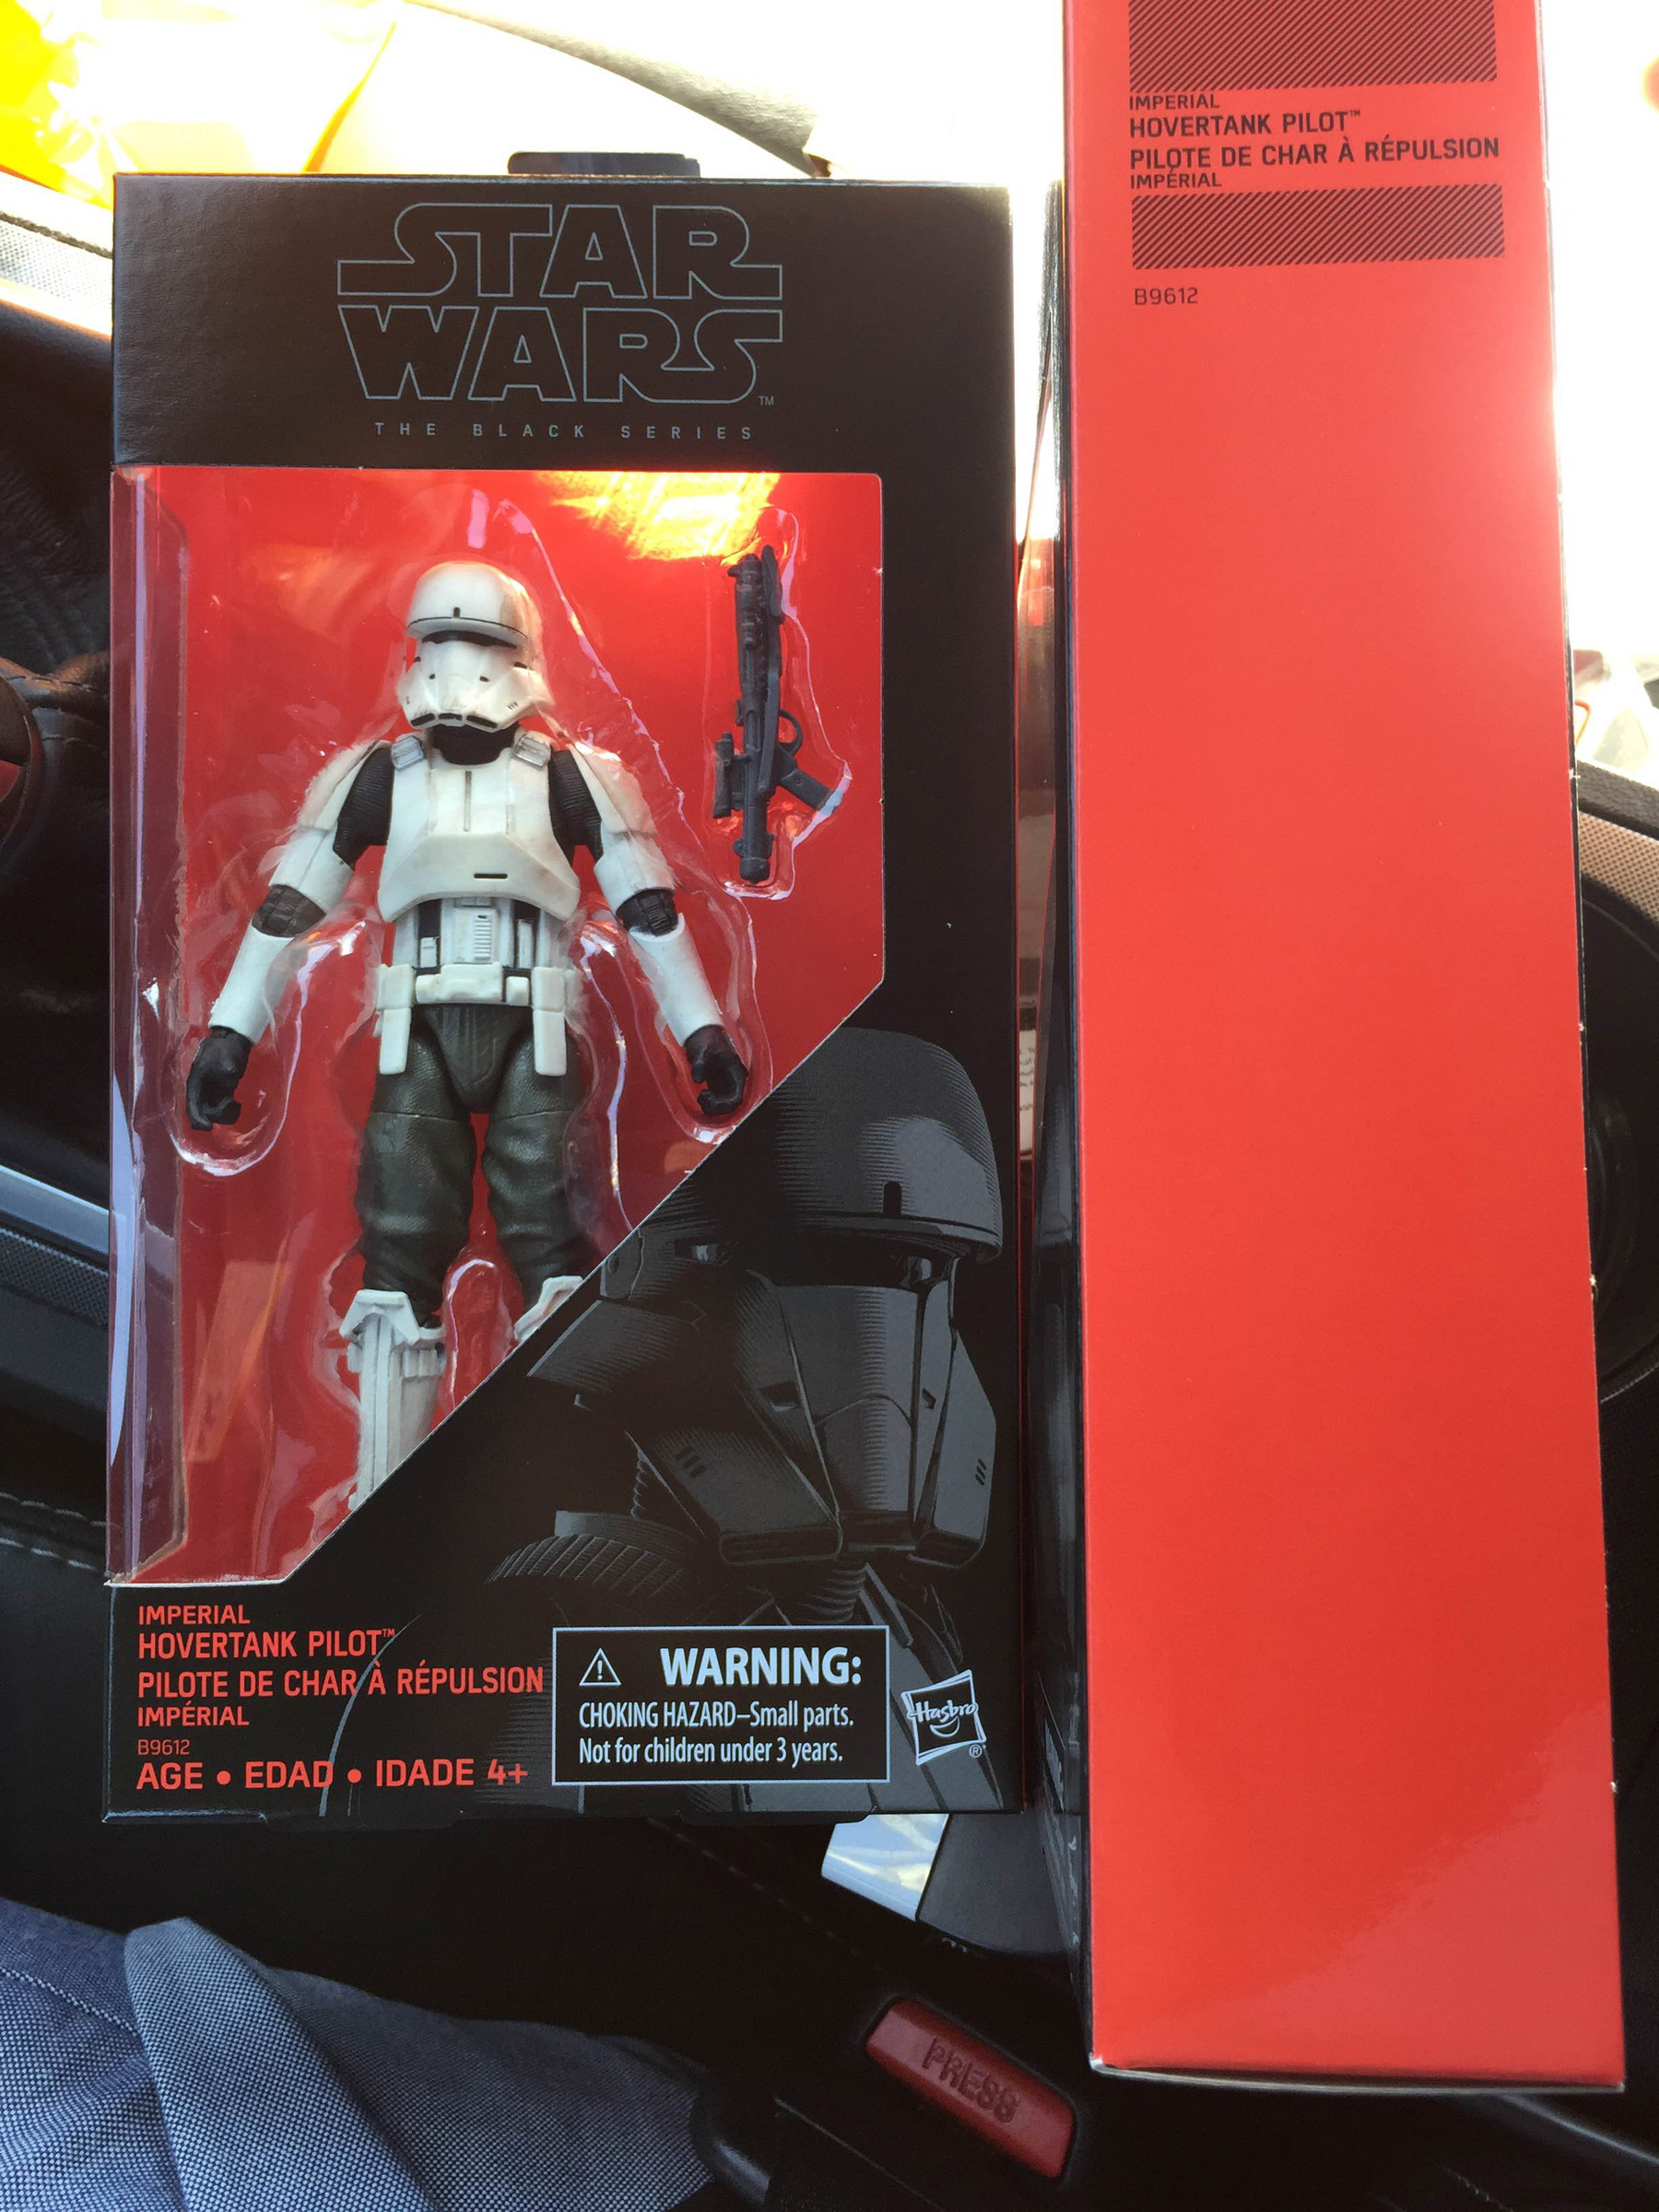 figurine star wars black collector 15cm pilote rhino trooper